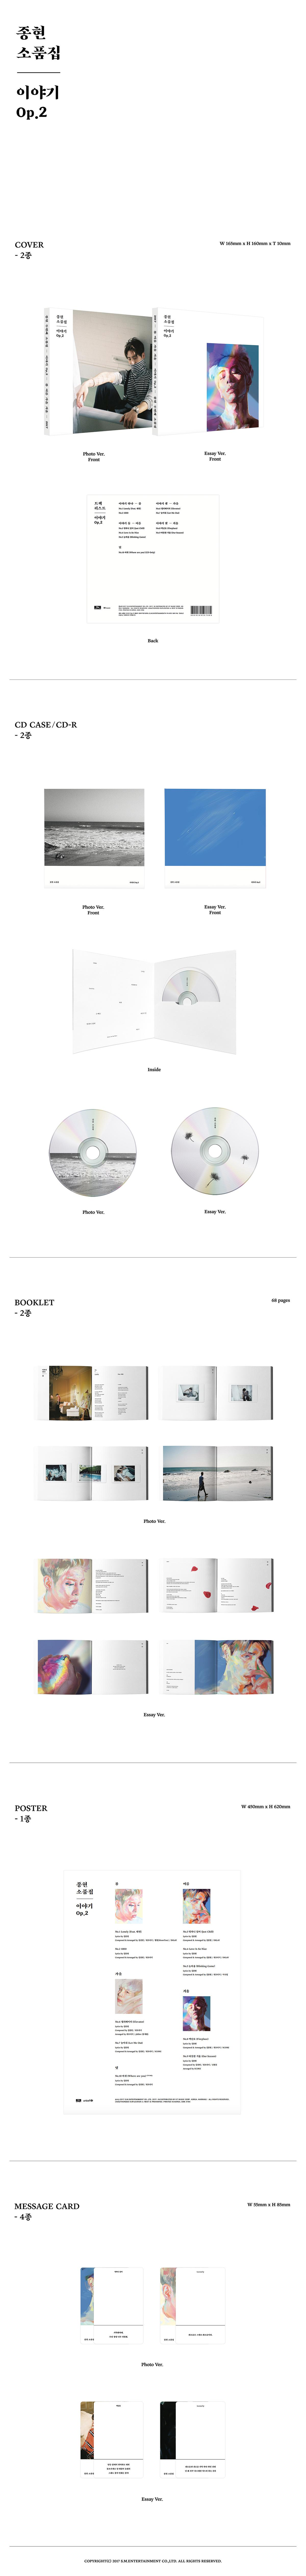 albumdetails_jonghyun.jpg